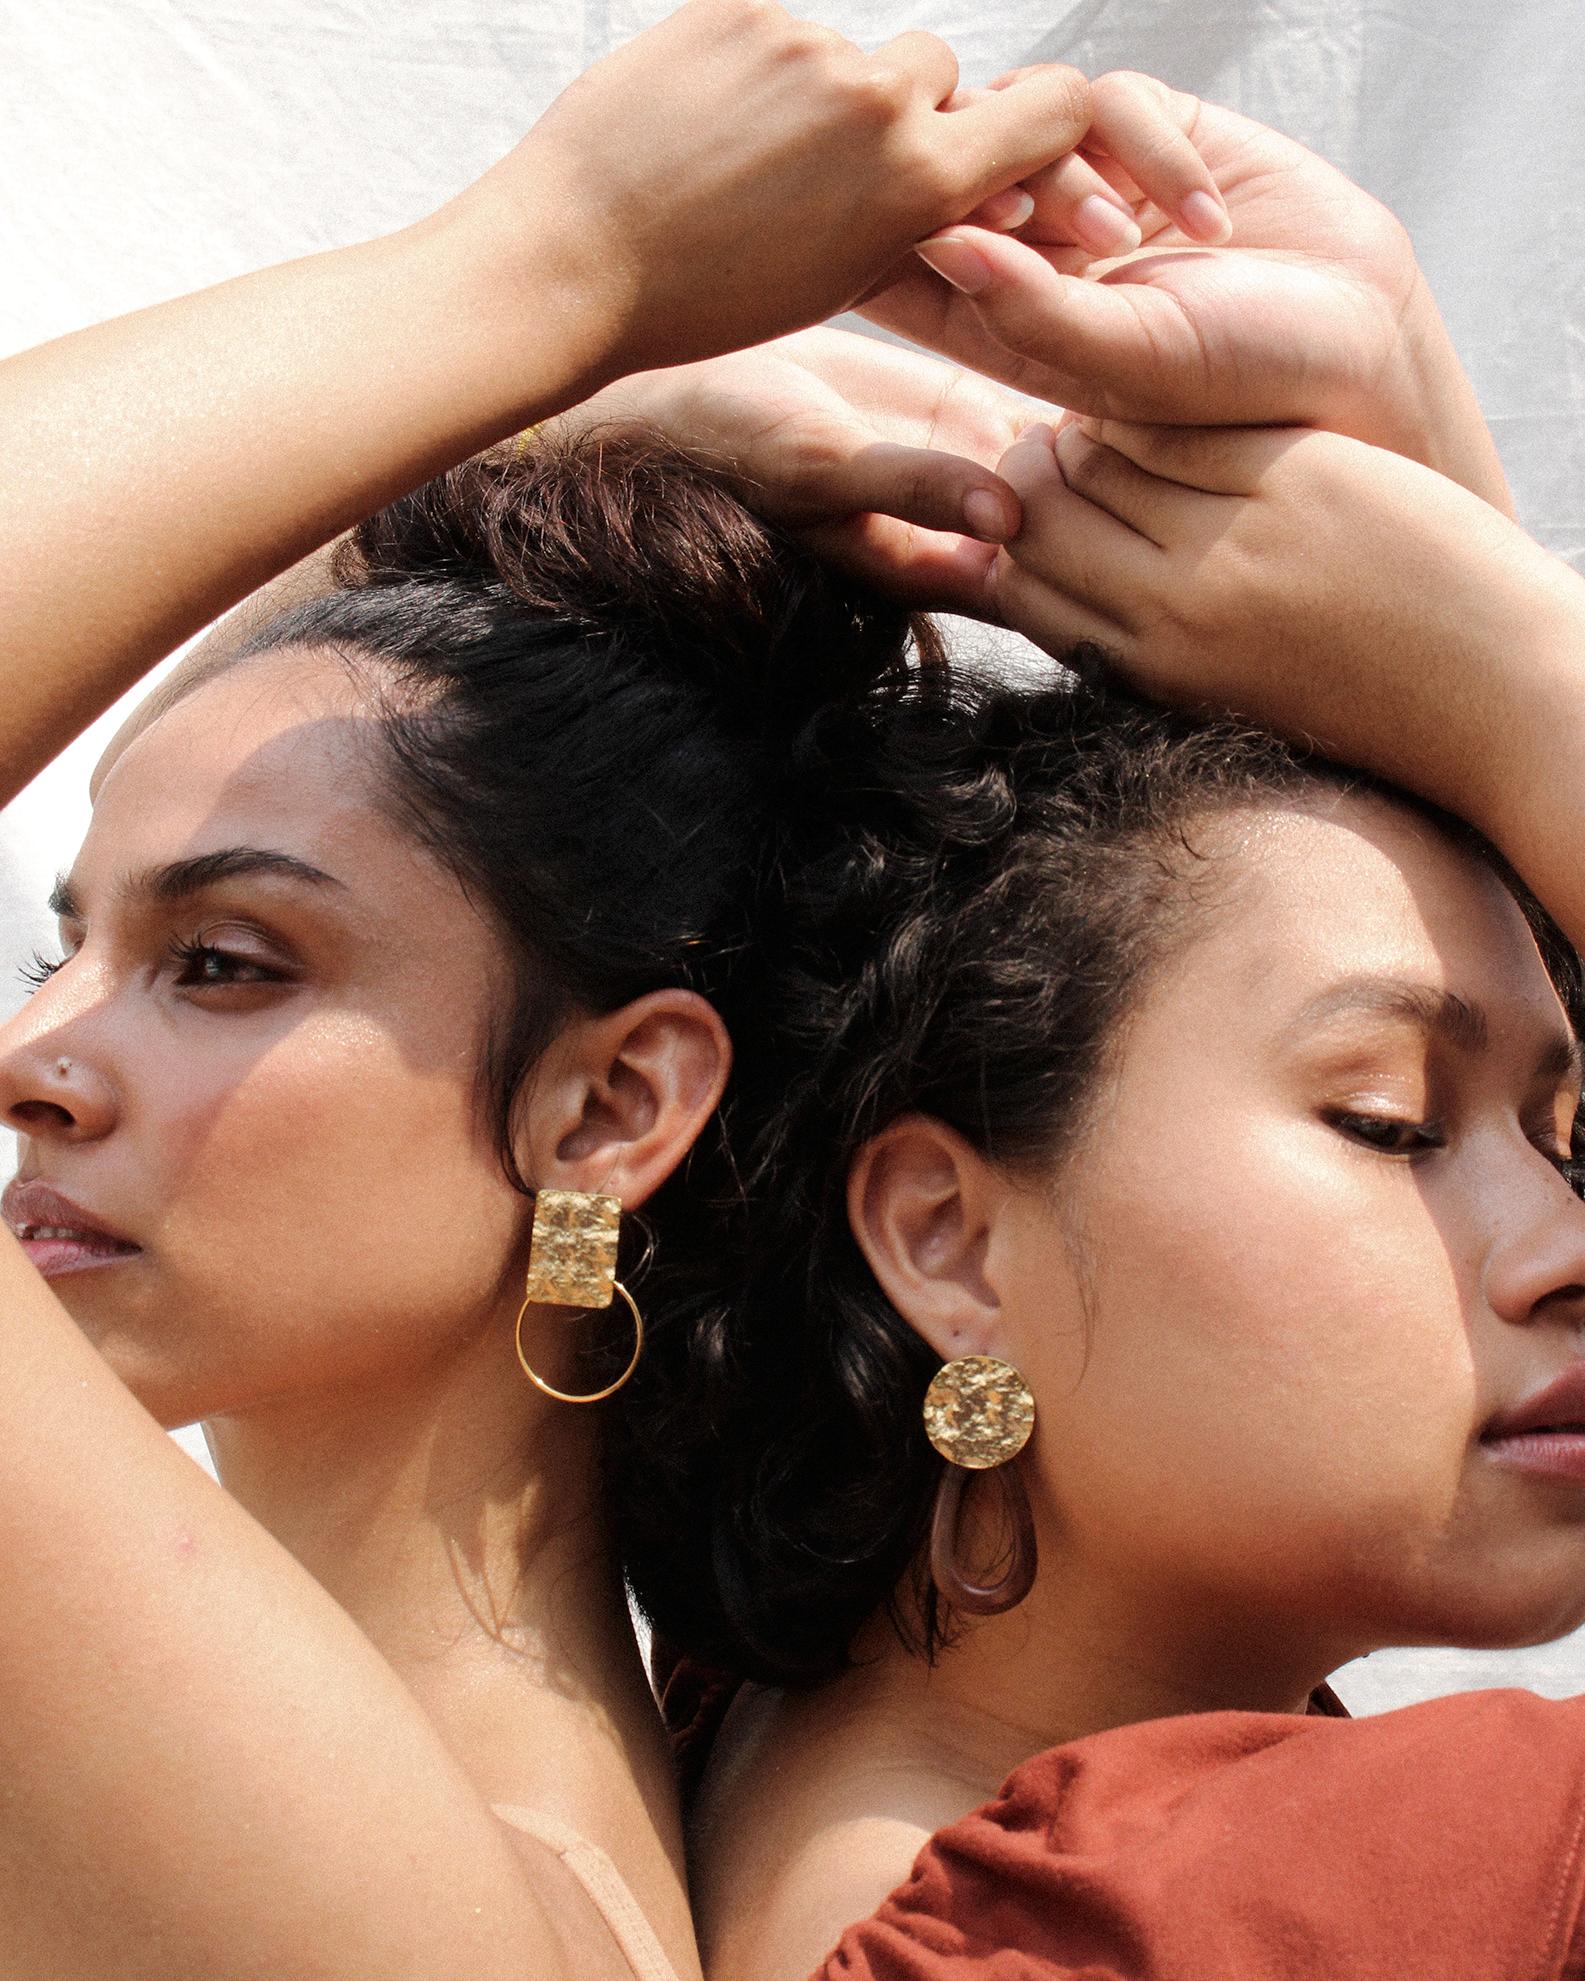 Ashkiro Earrings  and  Siddi Earrings